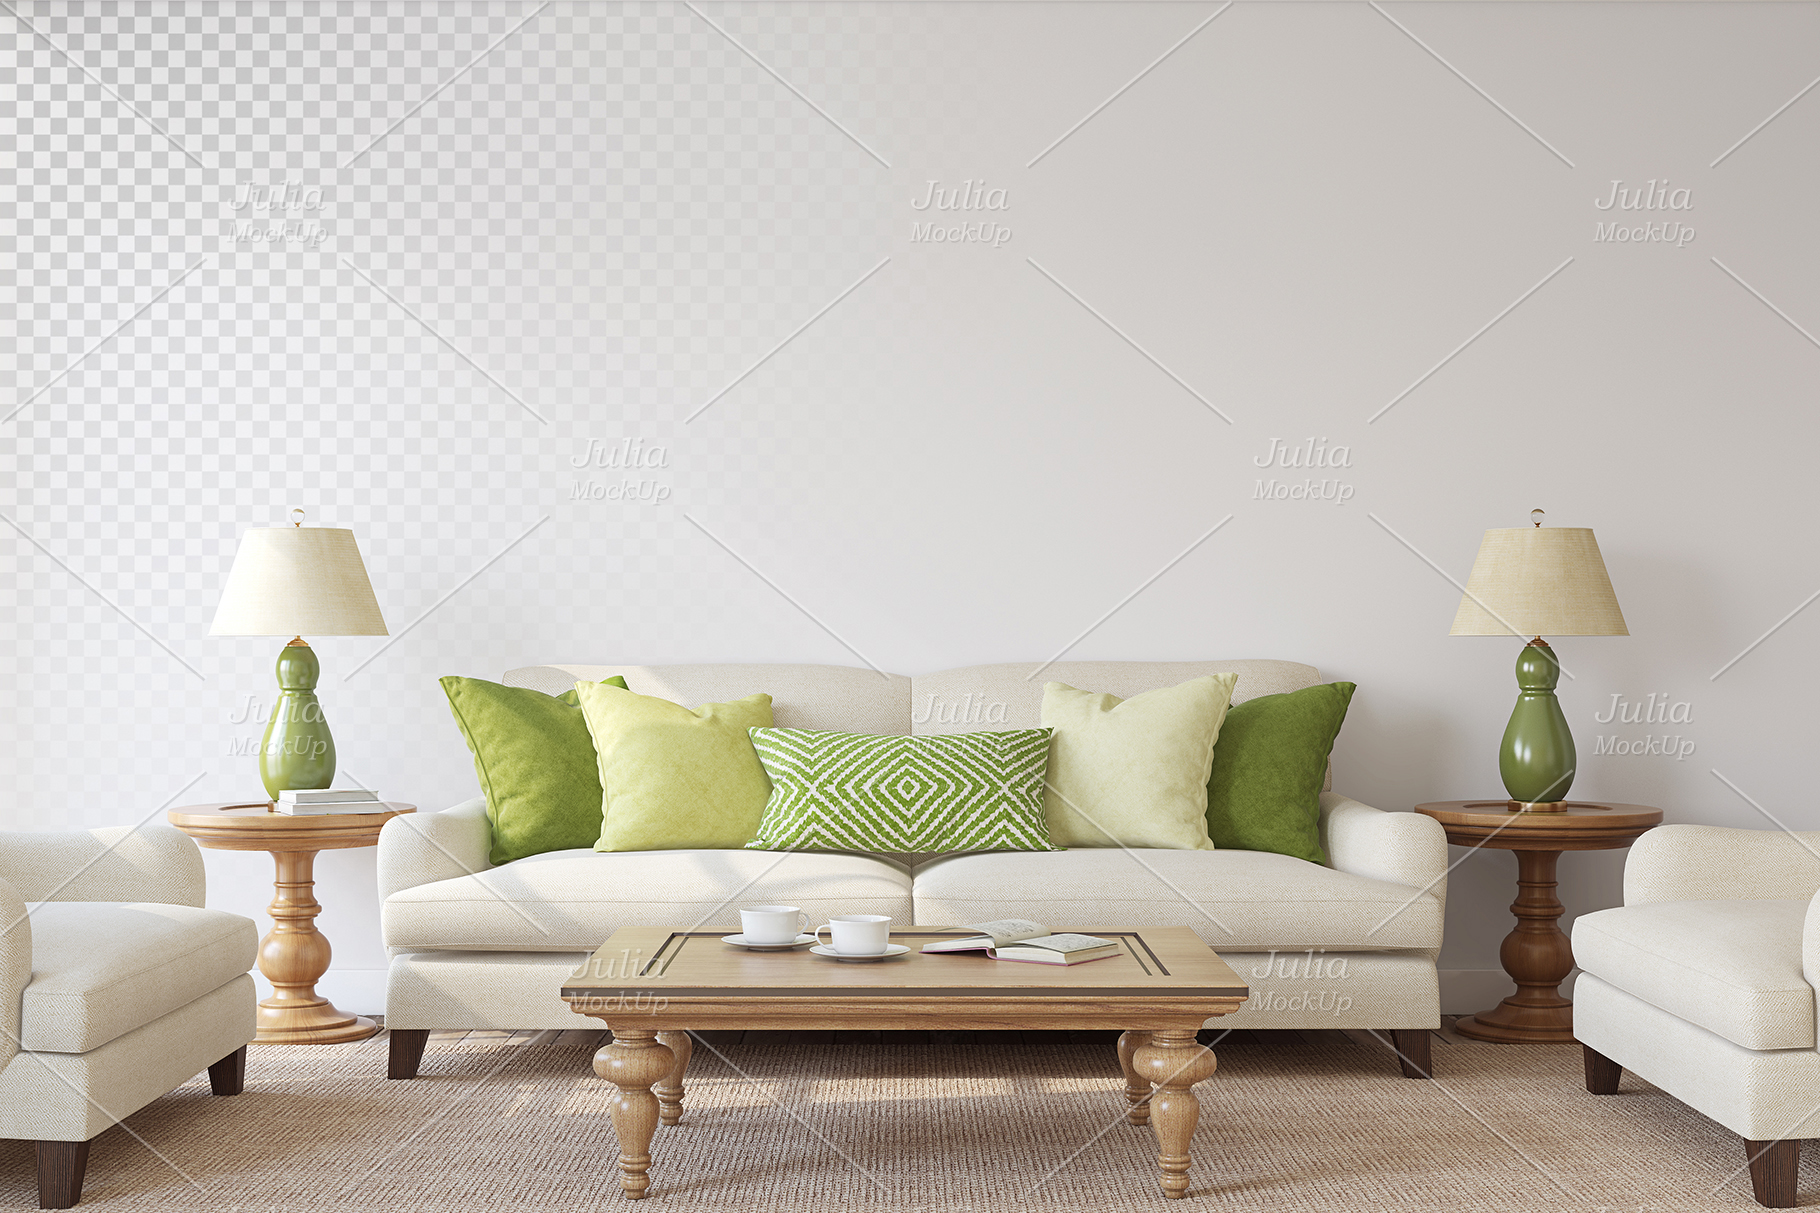 Living-room interiors. Wall&Frames Mockup. example image 4